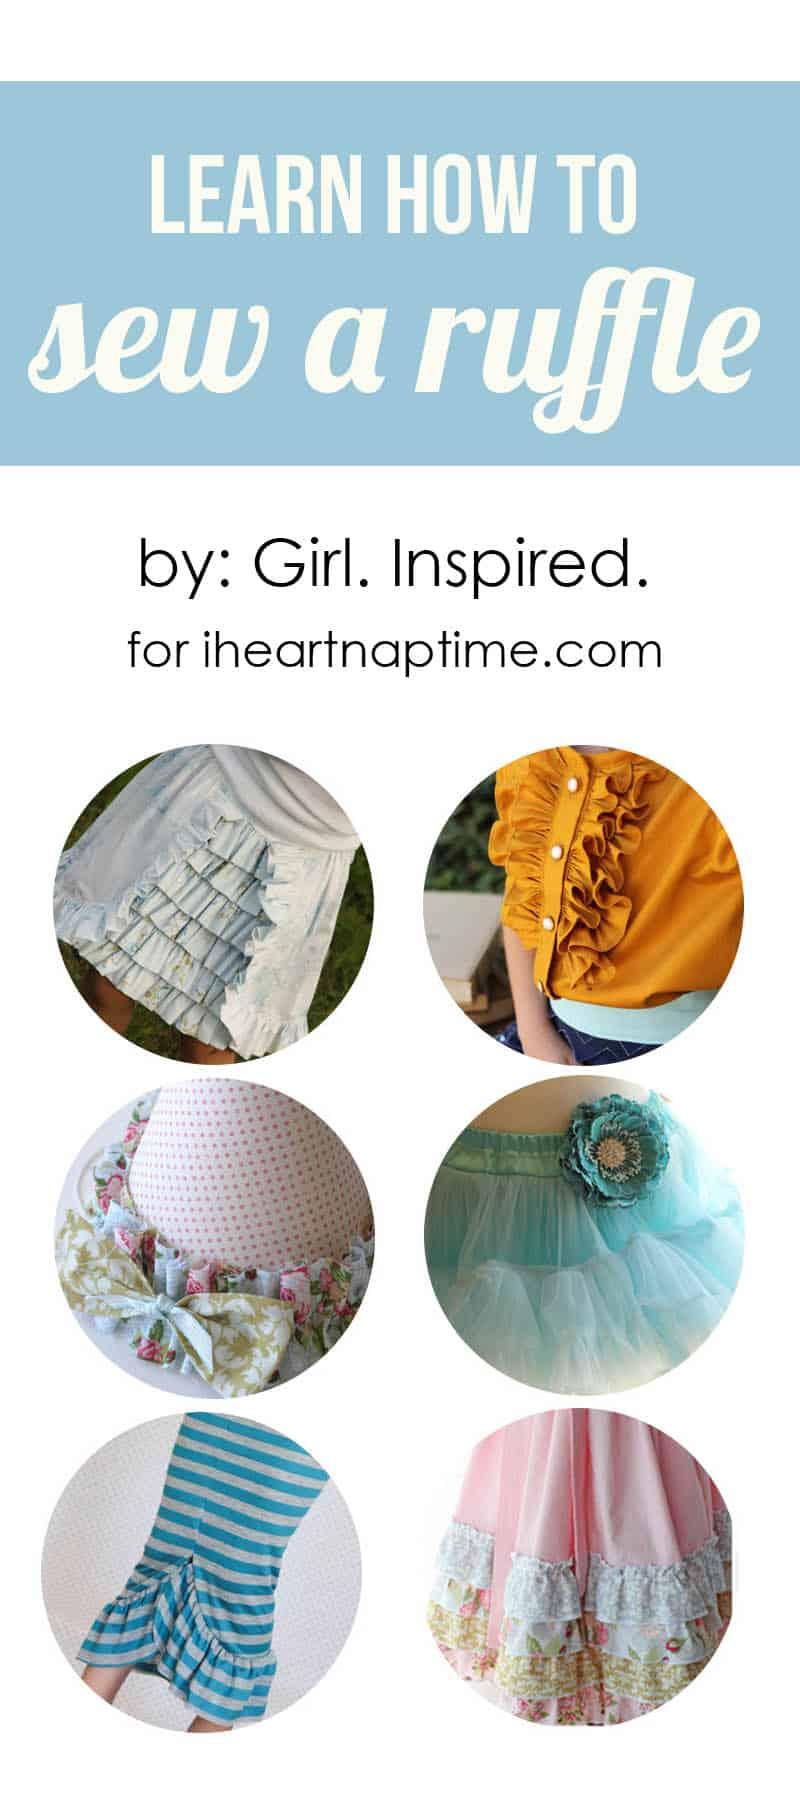 Learn how to sew a ruffle on iheartnaptime.com